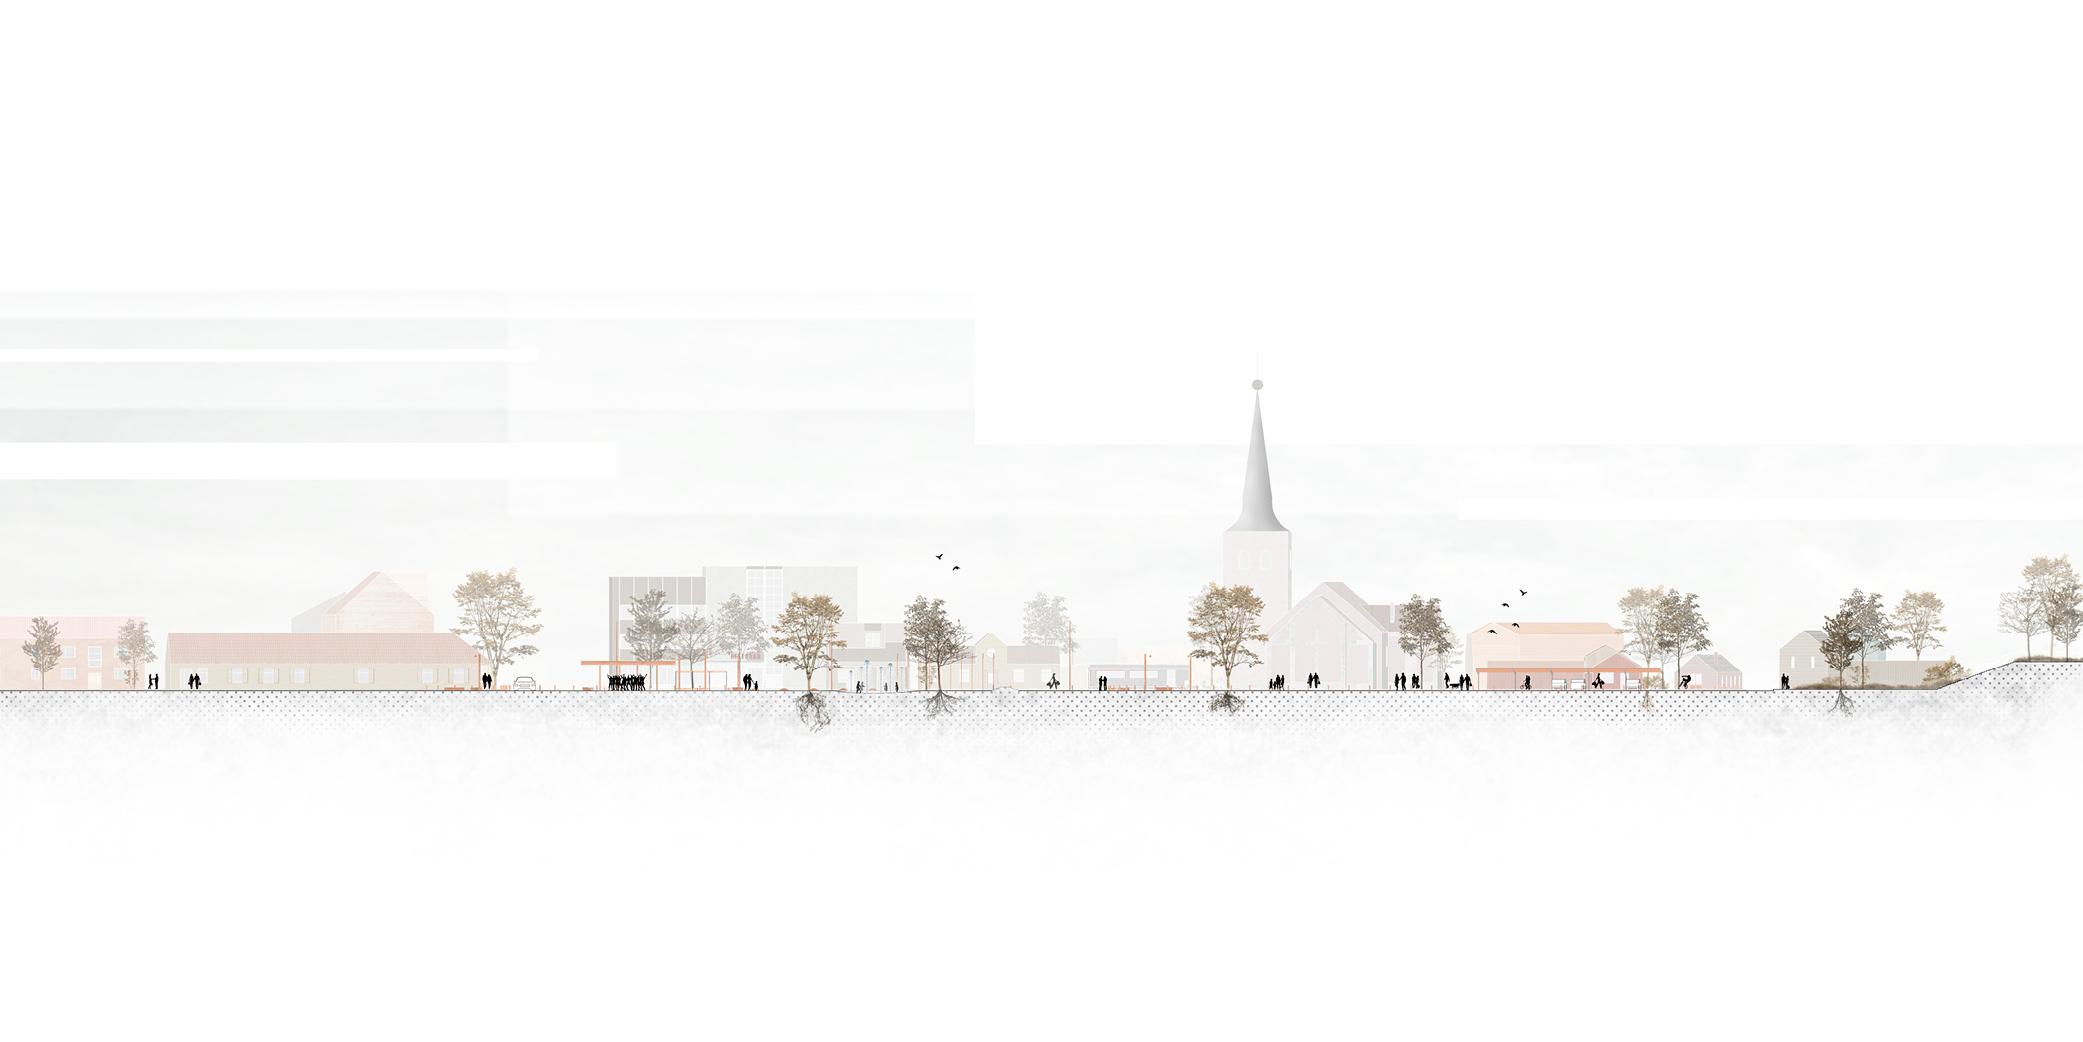 OCA architects urban architecture competition Paide Central Paide keskvaljaku arhitektuurivoistluse Hernan Lleida Ruiz Bernardo Garcia Morales Linn Nagel_web10